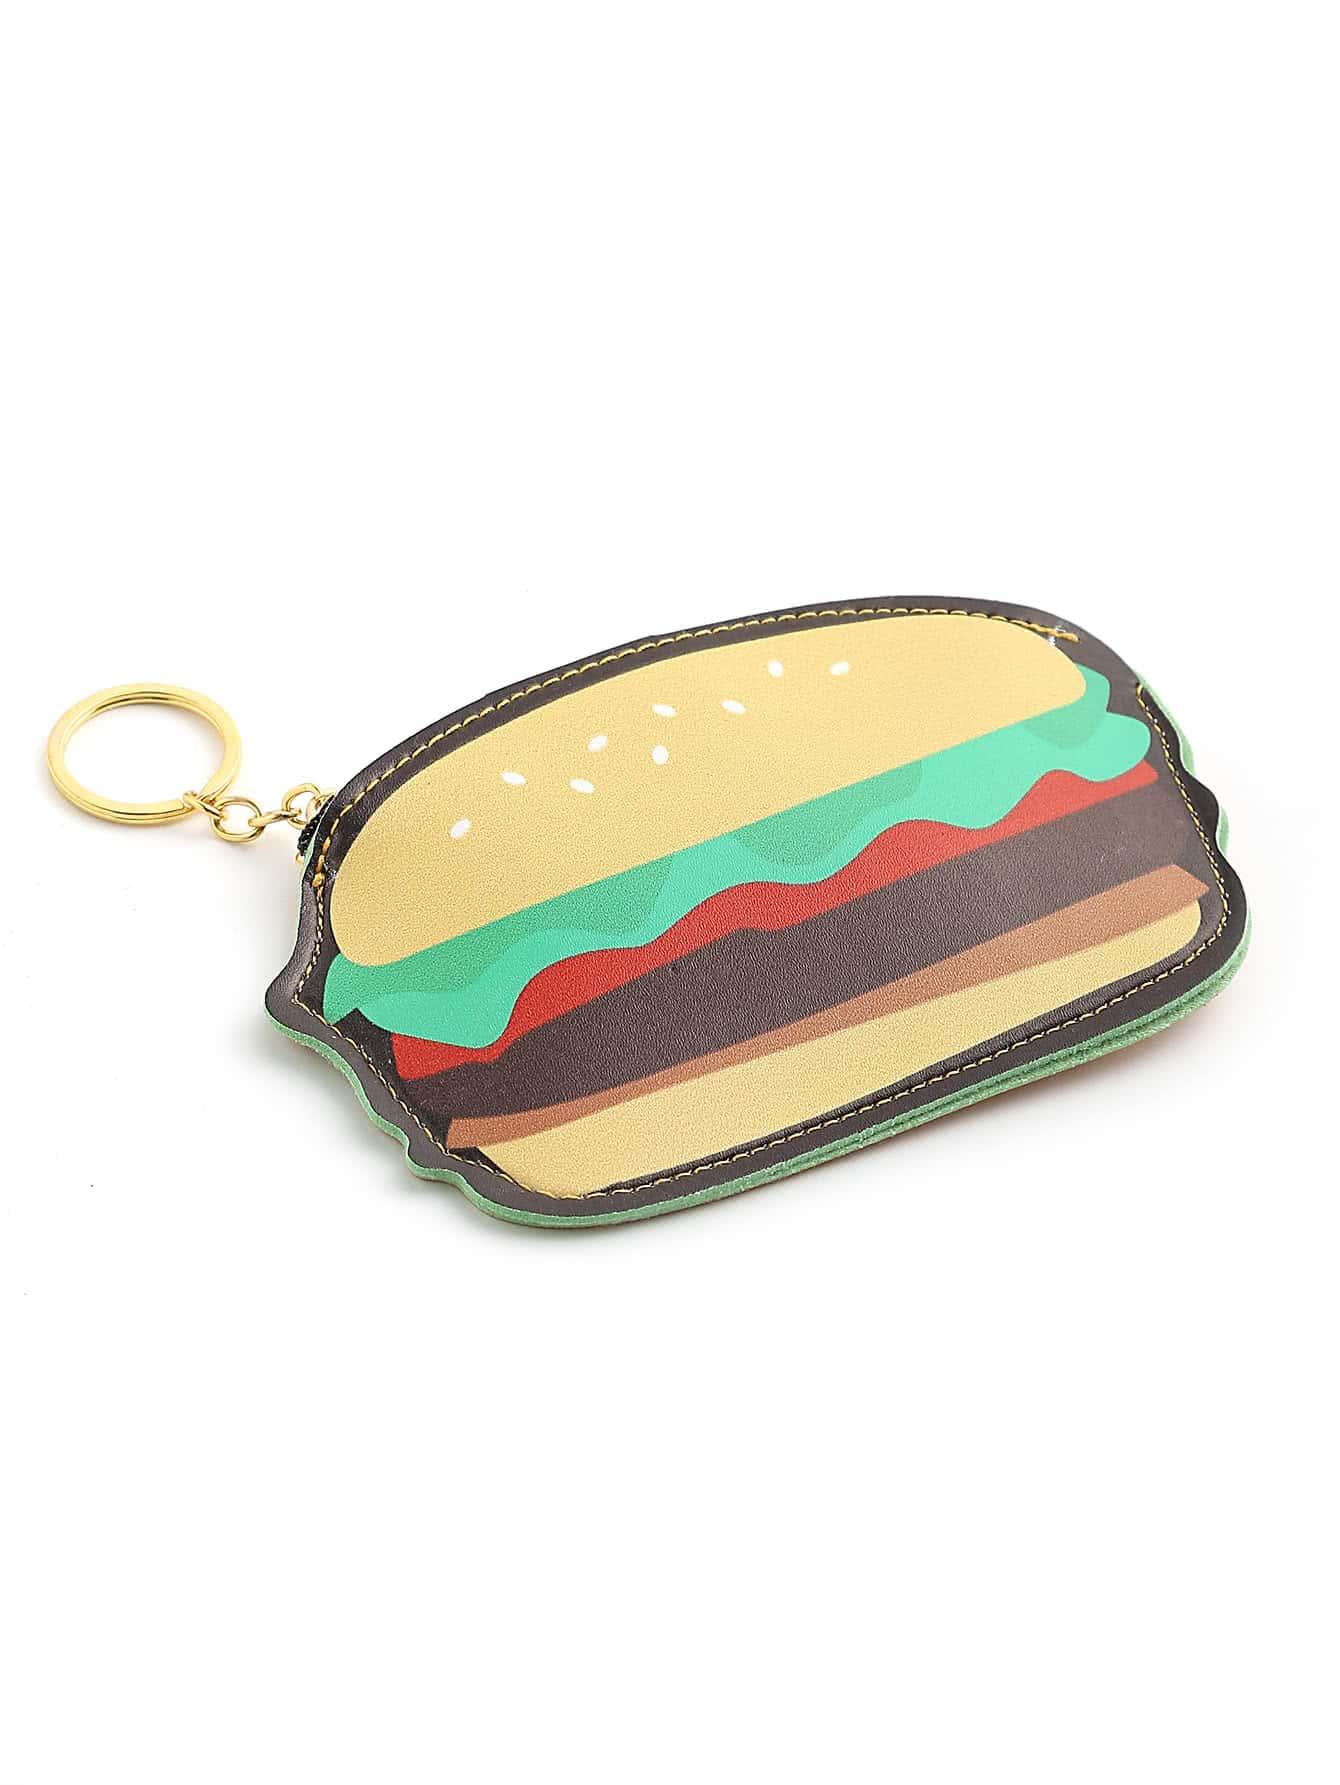 Фото Hamburger Shaped Coin Purse. Купить с доставкой